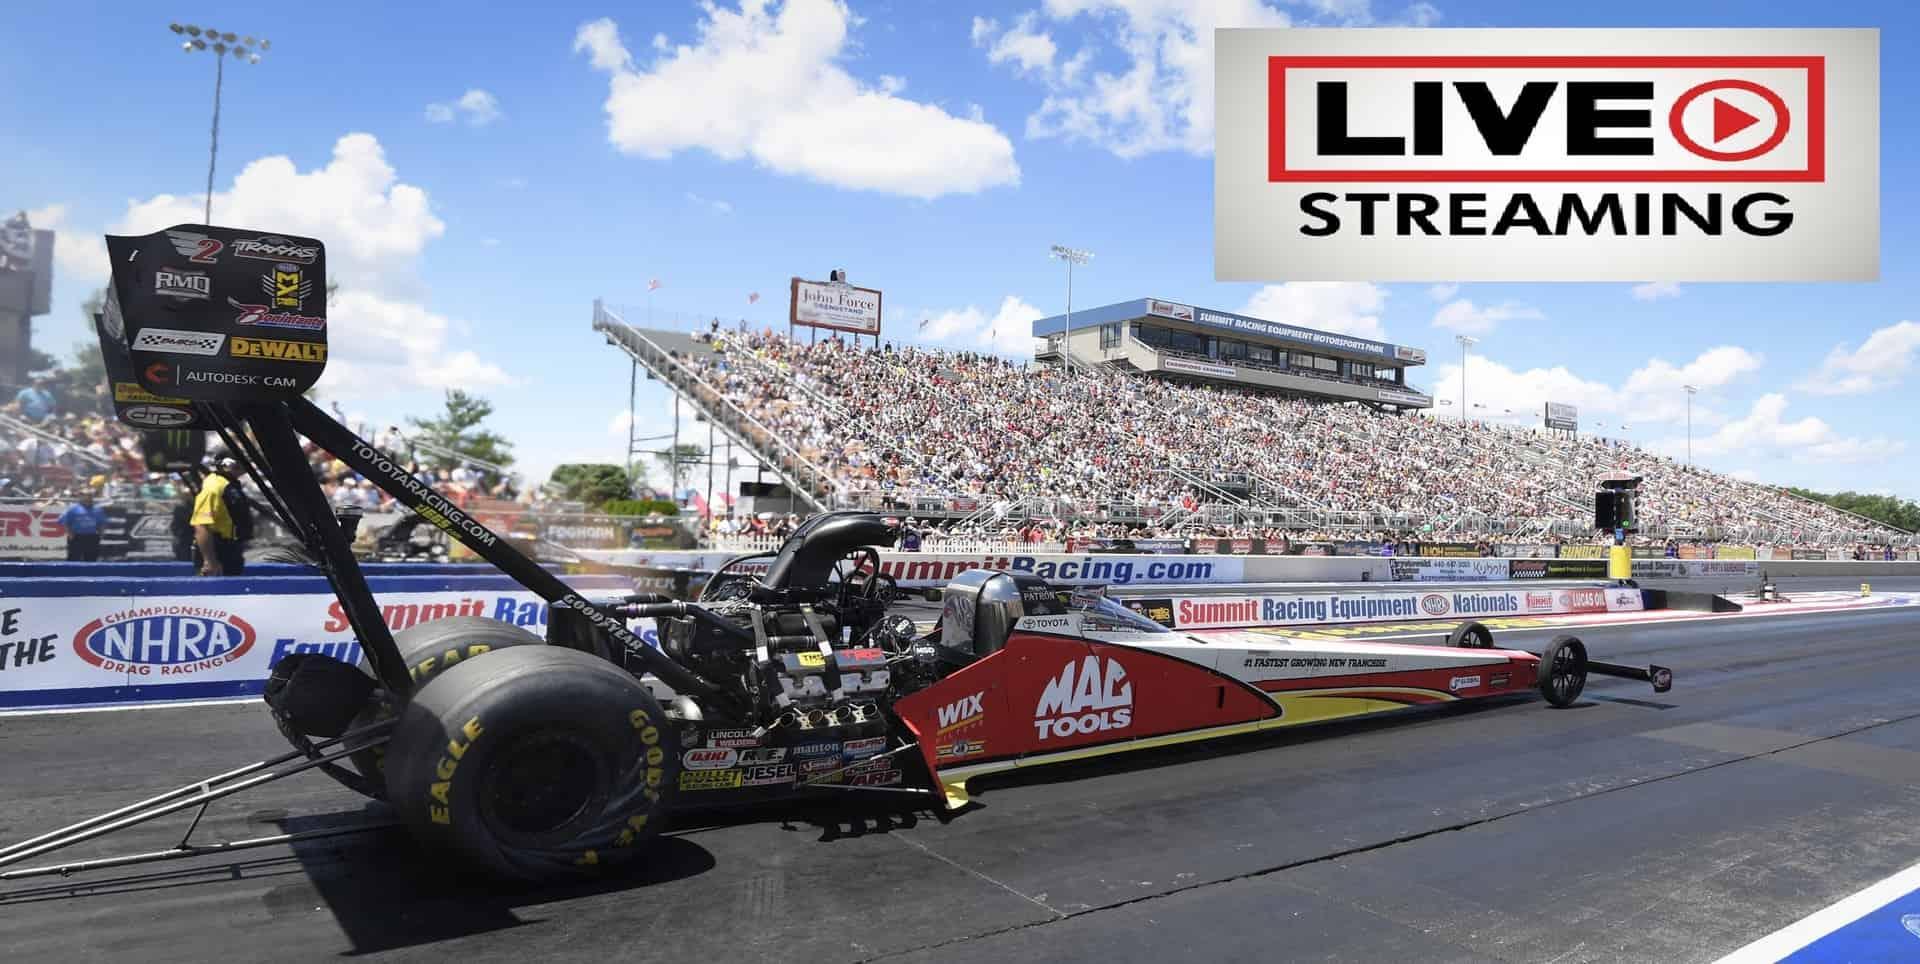 2015 O Reilly Auto Parts NHRA Spring Nationals Live Streaming